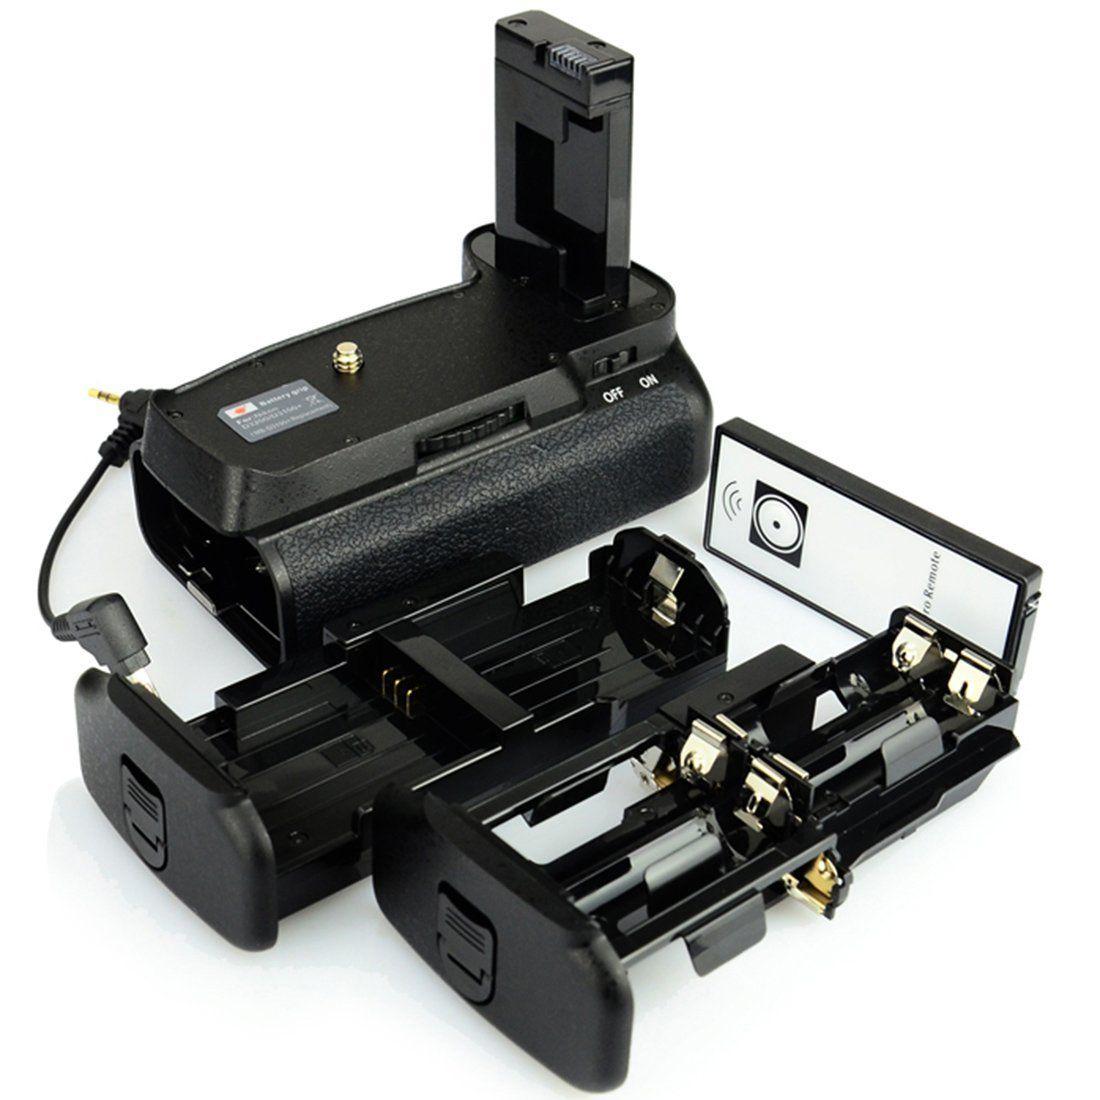 BATTERY GRIP MB-D3100 PARA NIKON D3100 D3200 D3300 D5300